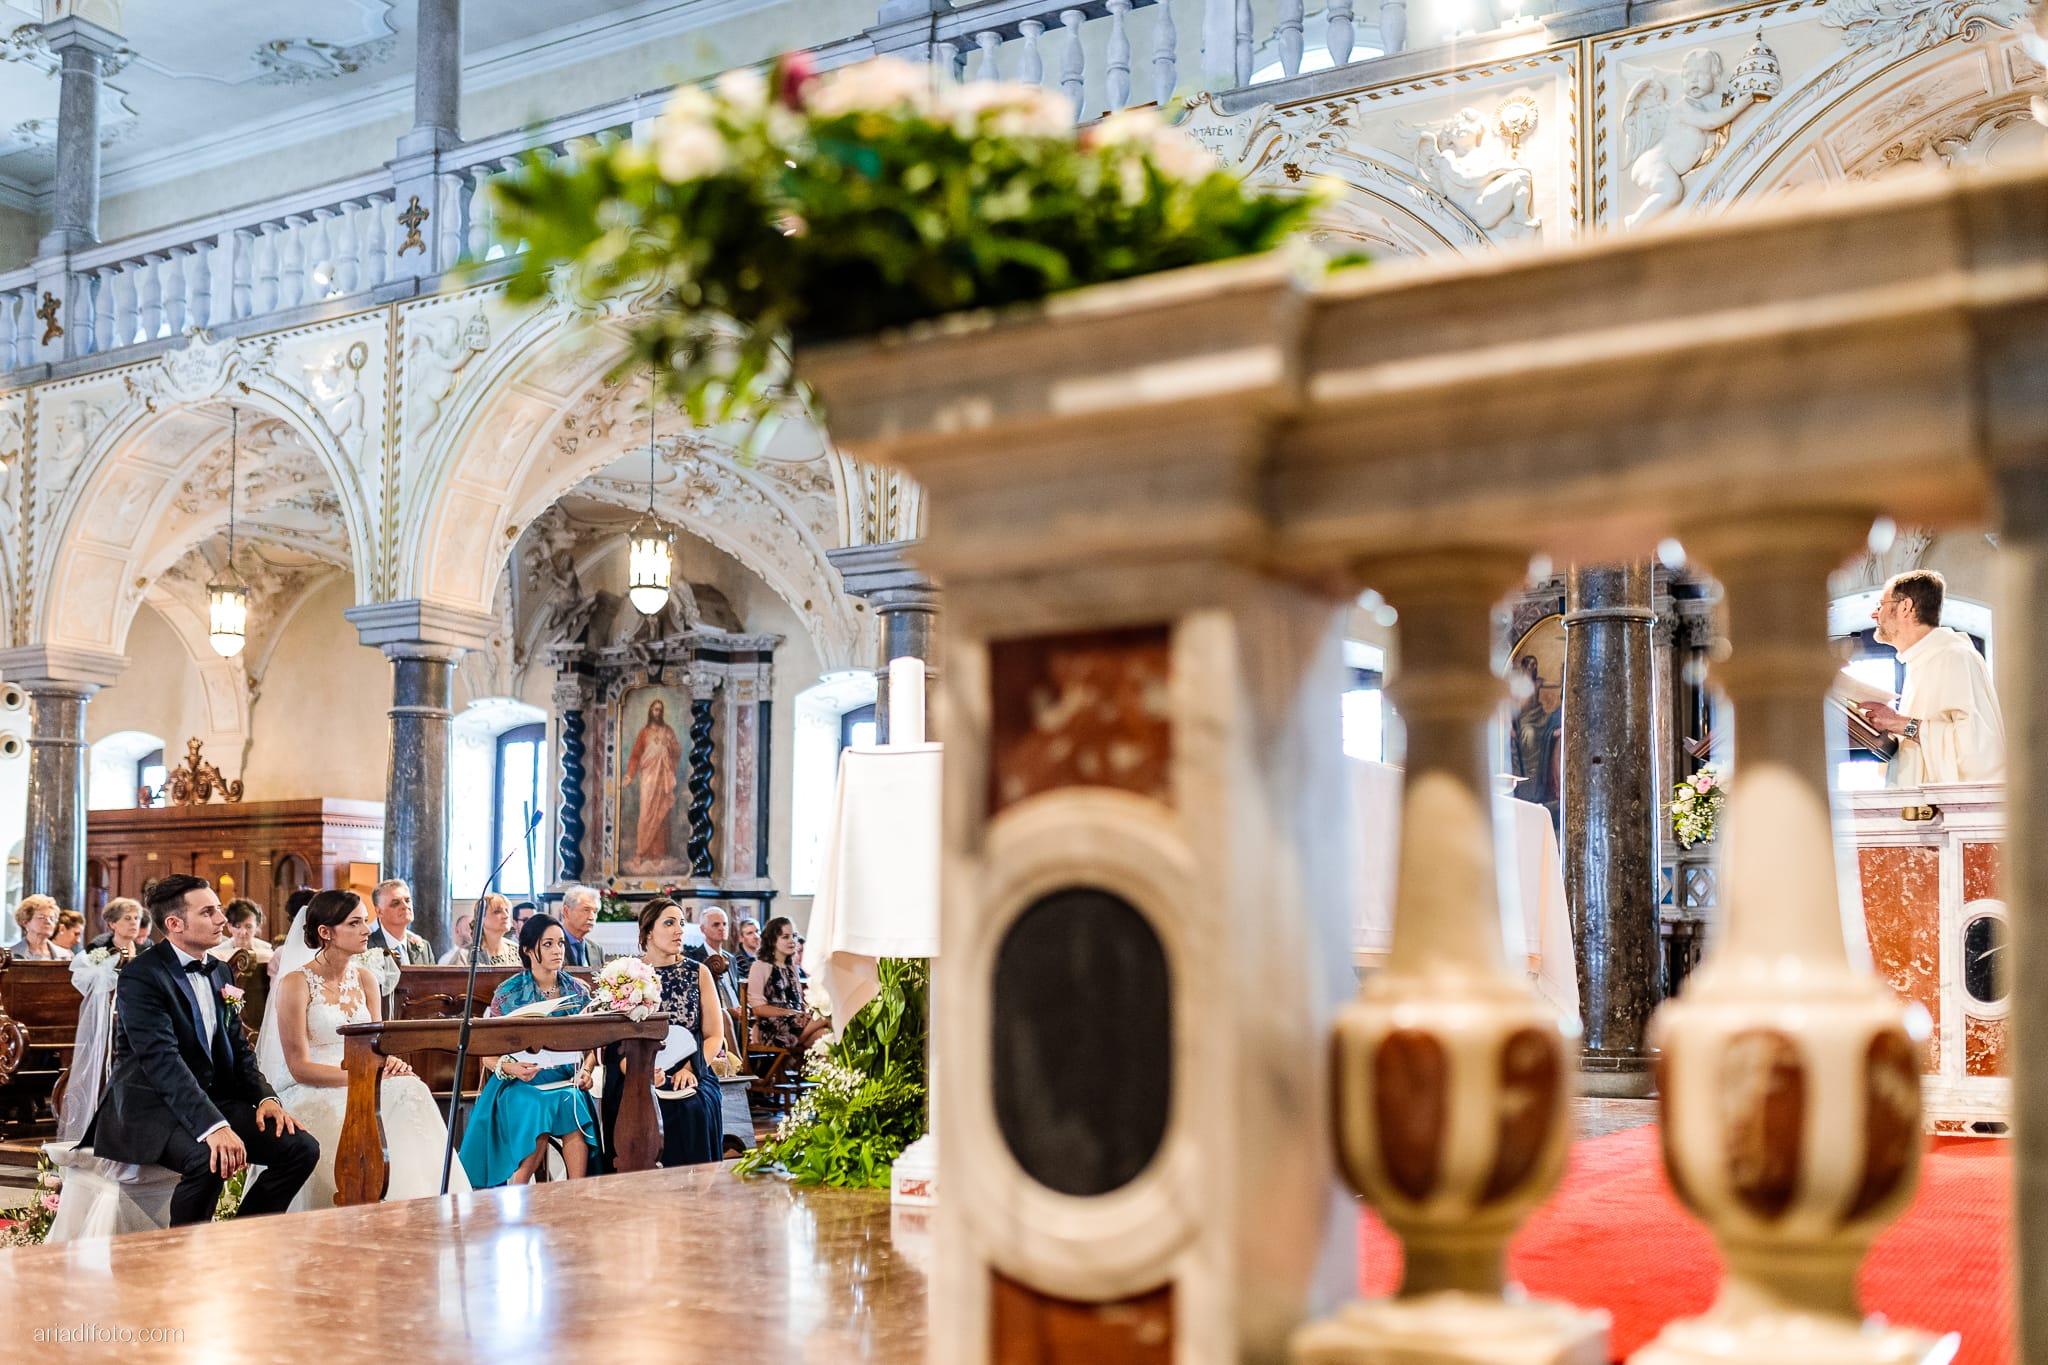 Valentina Marco Matrimonio Duomo Gorizia Castelvecchio Sagrado cerimonia cattolica